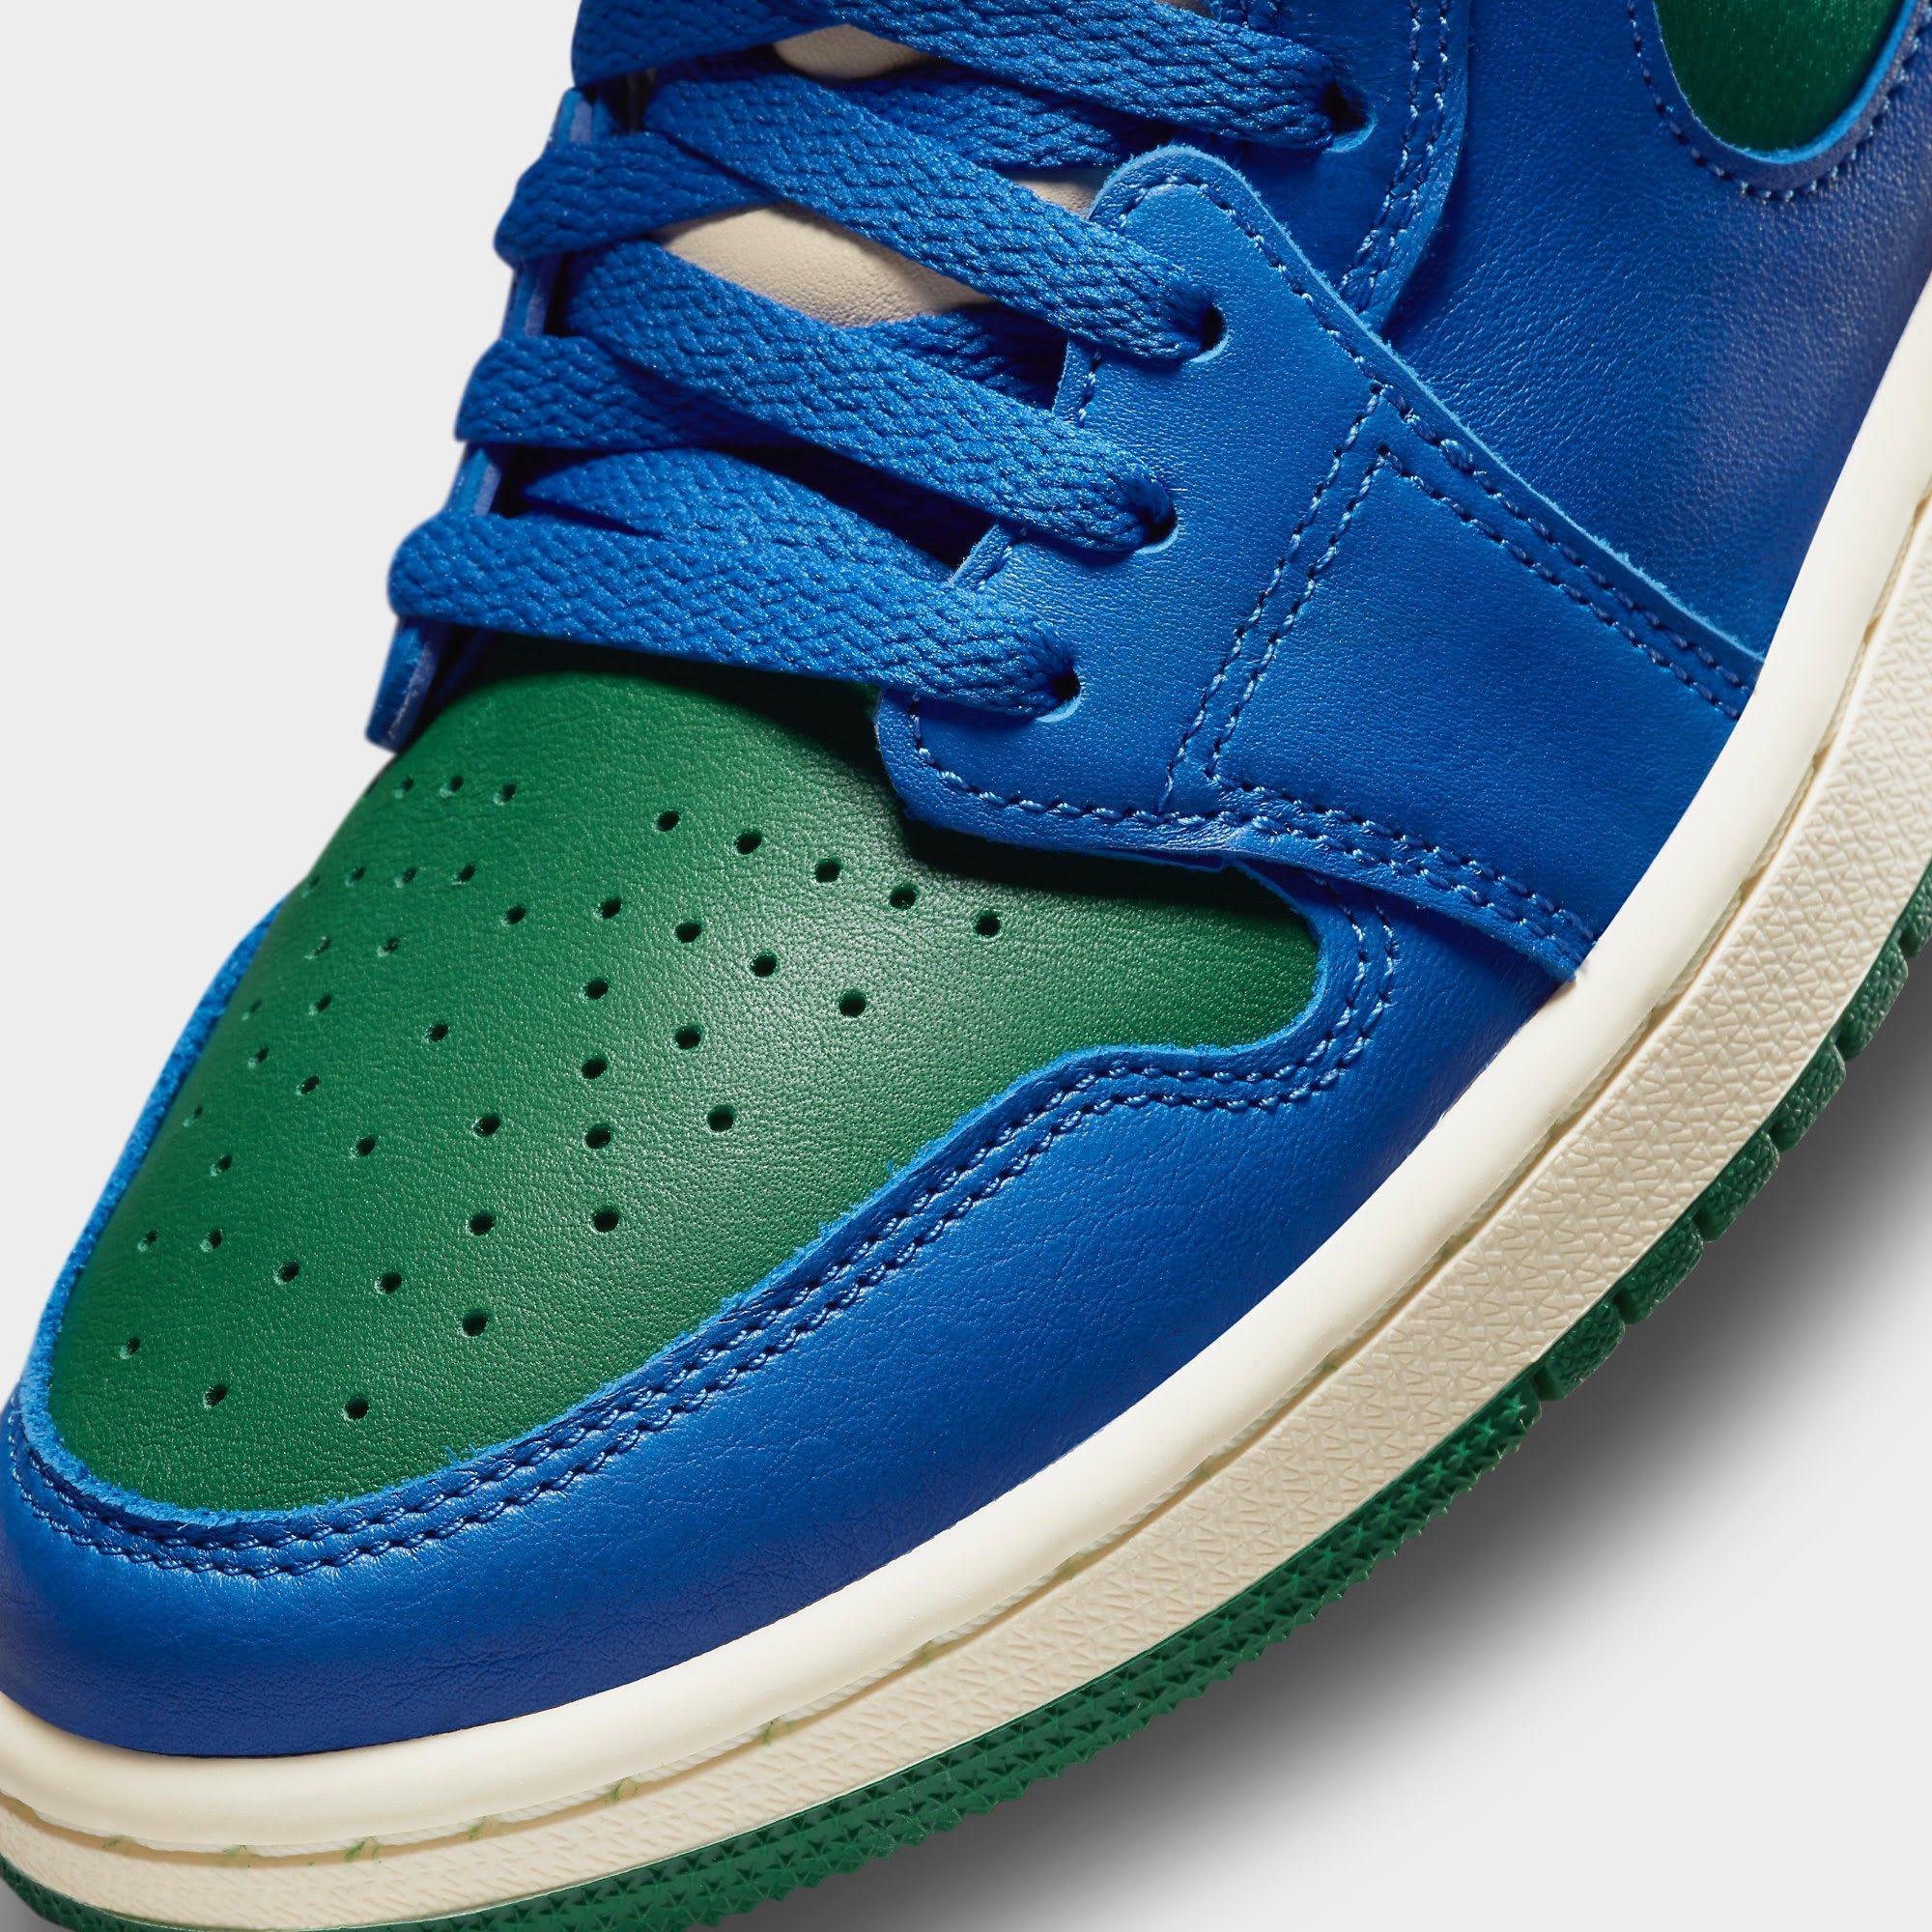 Aleali May x Air Jordan 1 Zoom CMFT Release Date Toe Detail